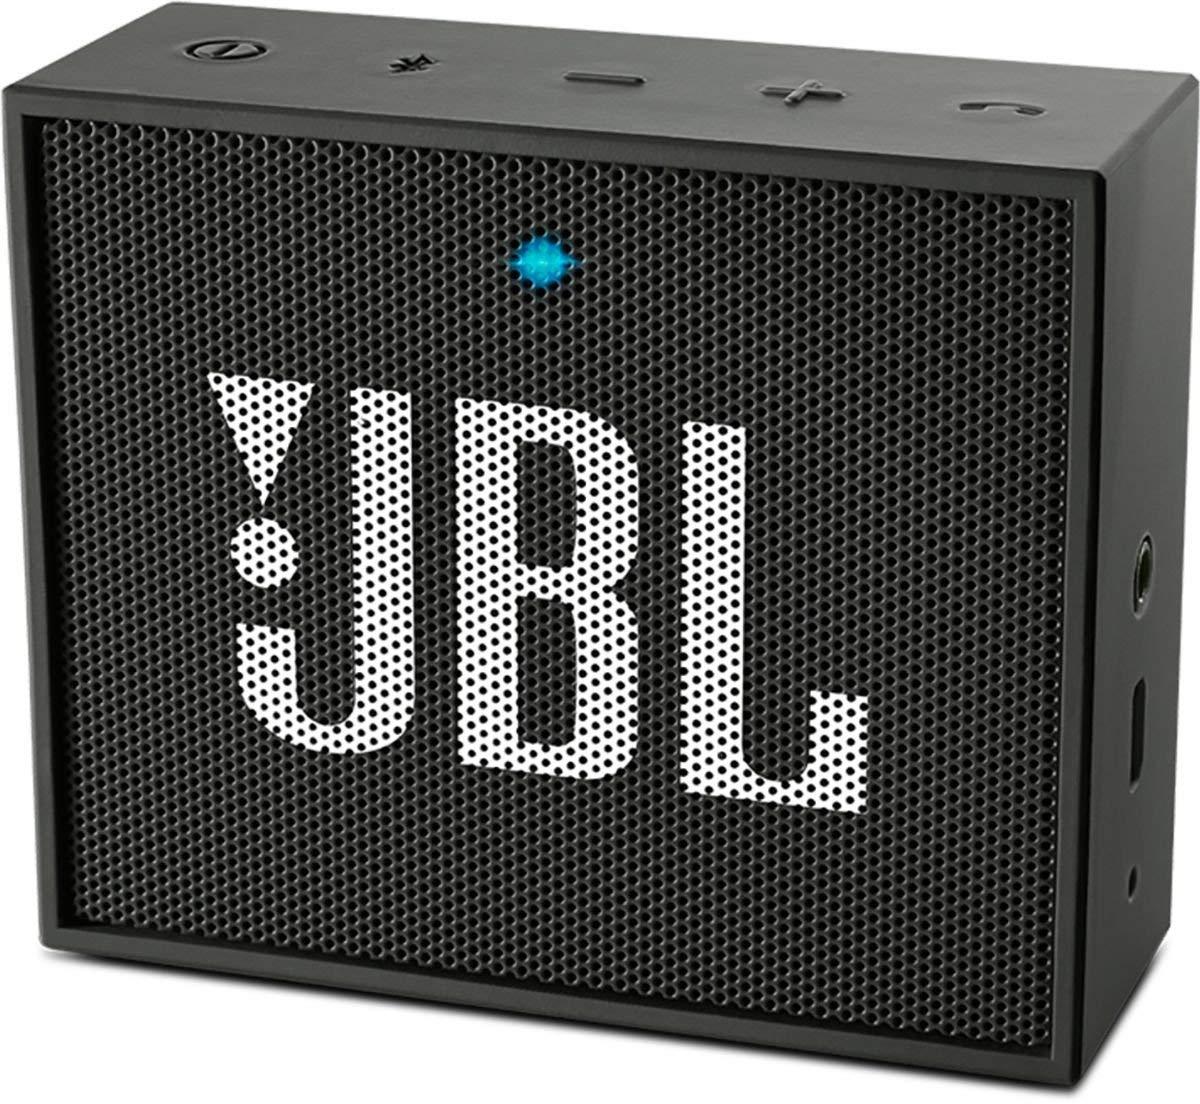 Spectifications, Price JBL Go Portable Wireless Bluetooth Speaker